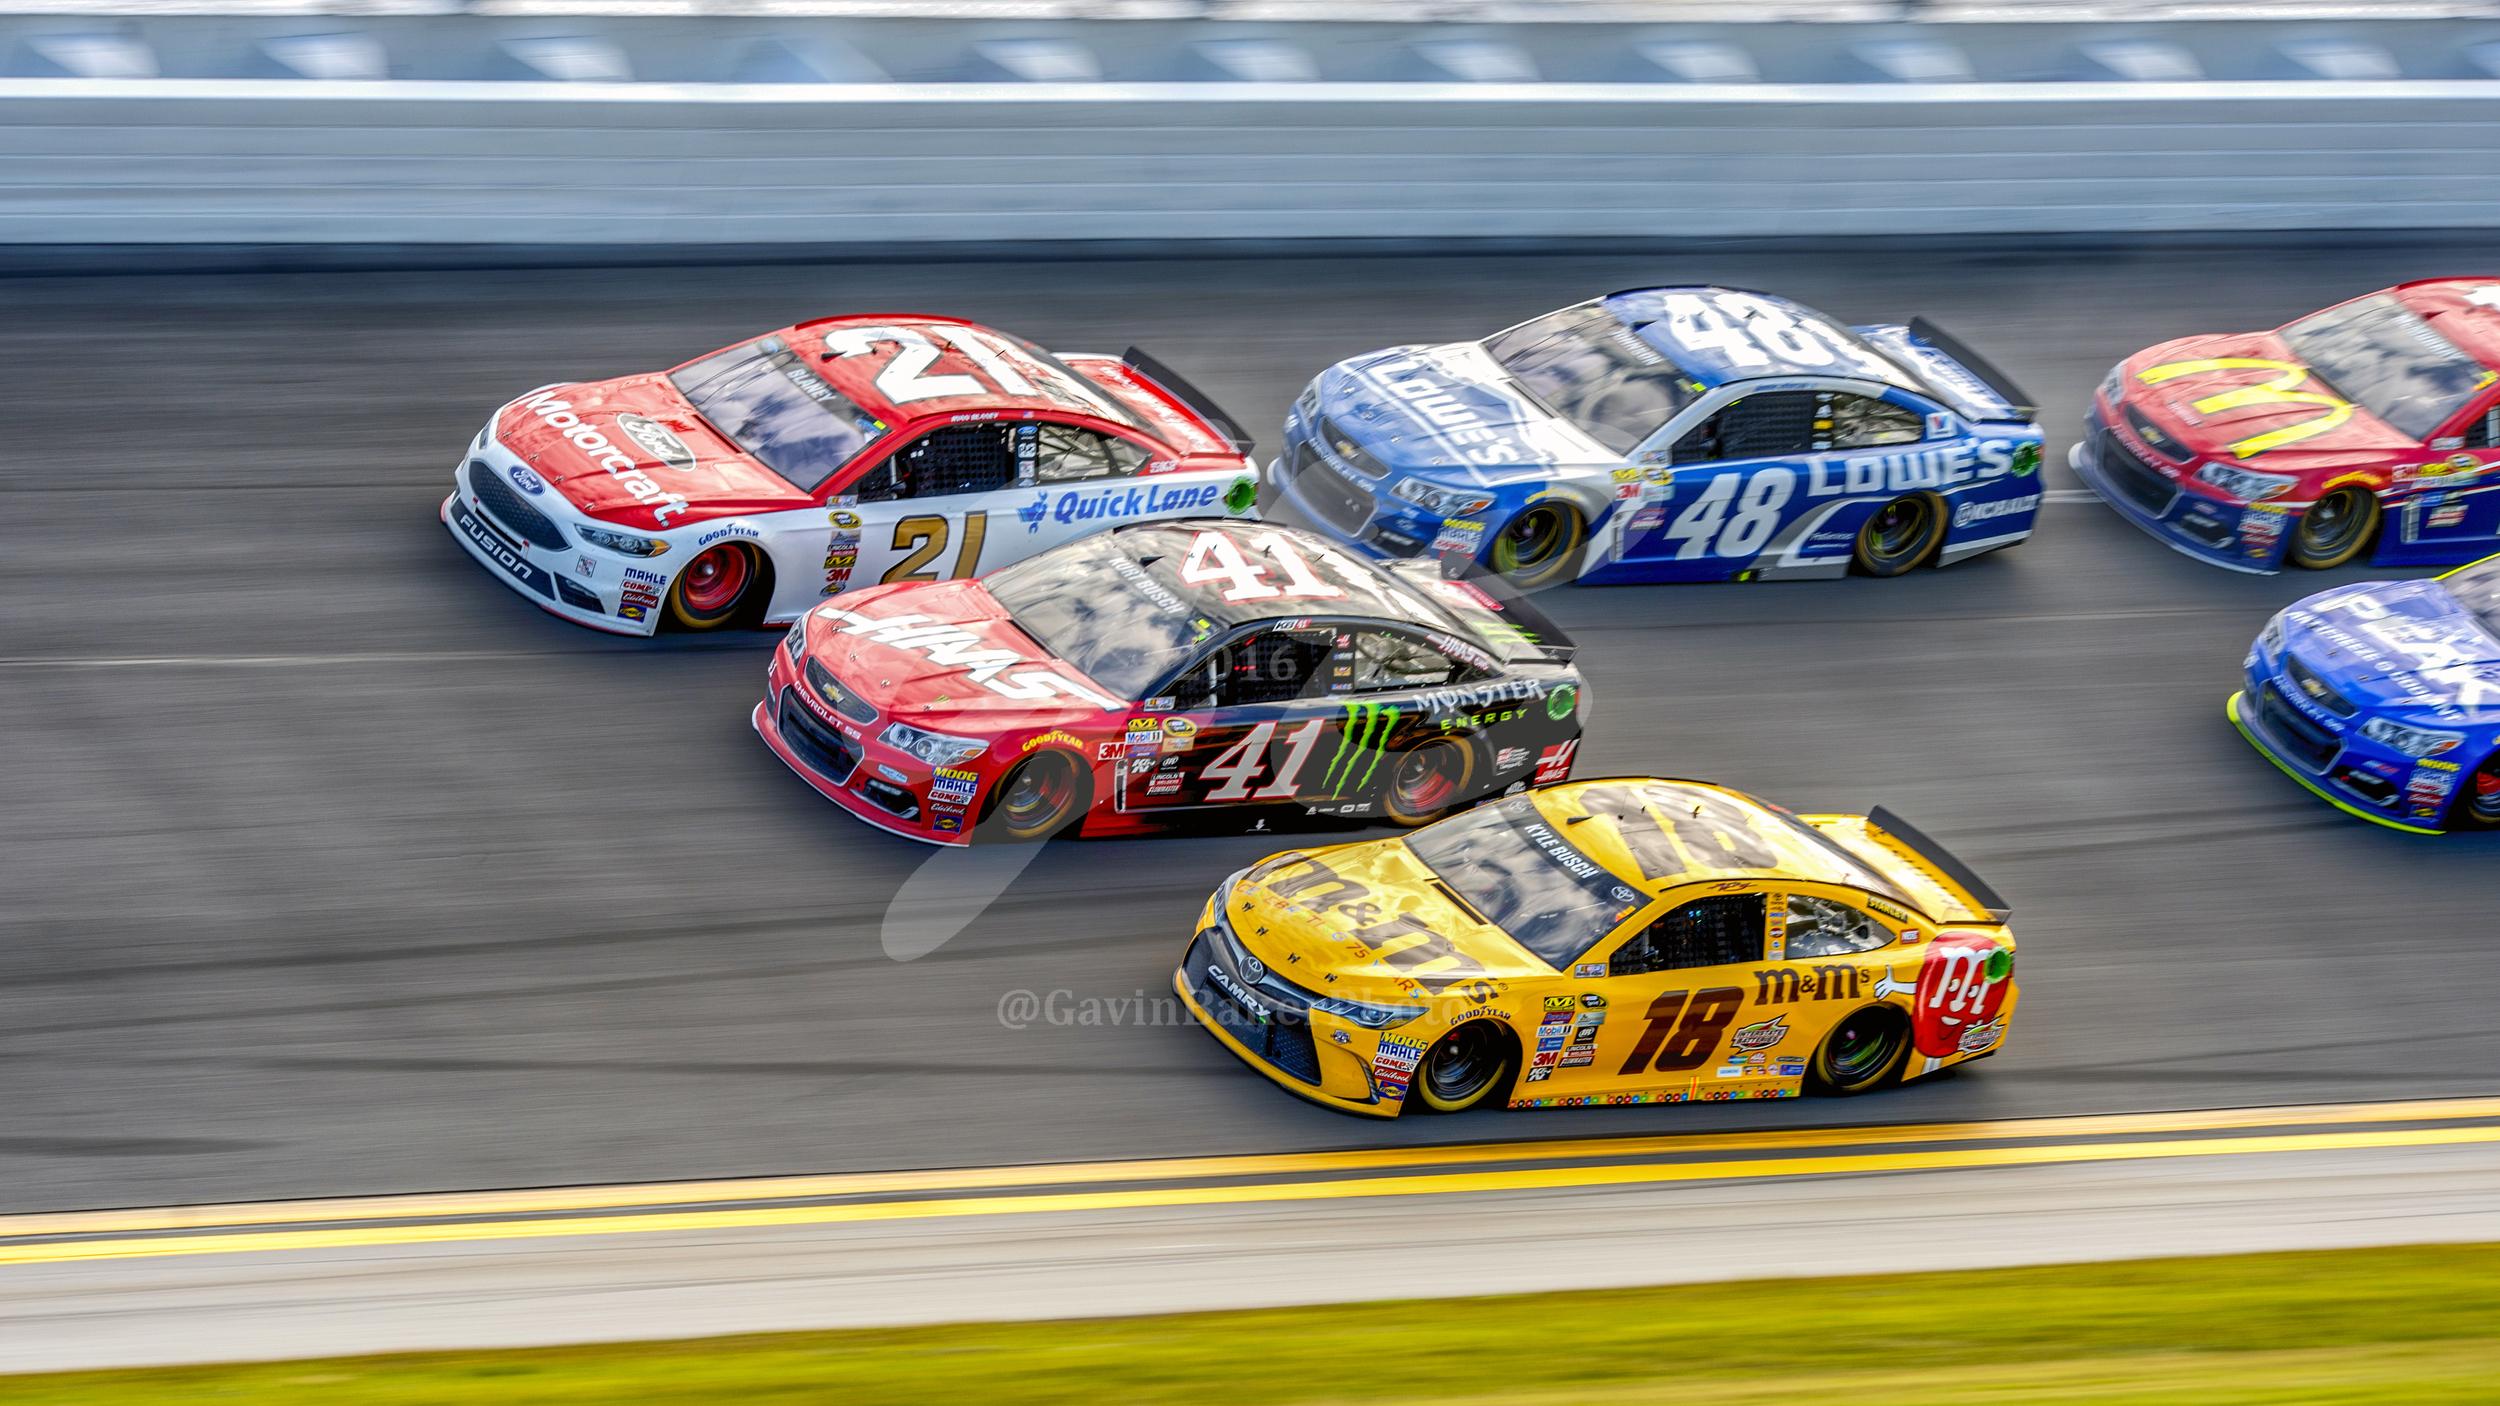 Kurt Busch, Kyle Busch, Ryan Blaney, and Jimmie Johnson lead the pack through turn one of the Daytona 500.